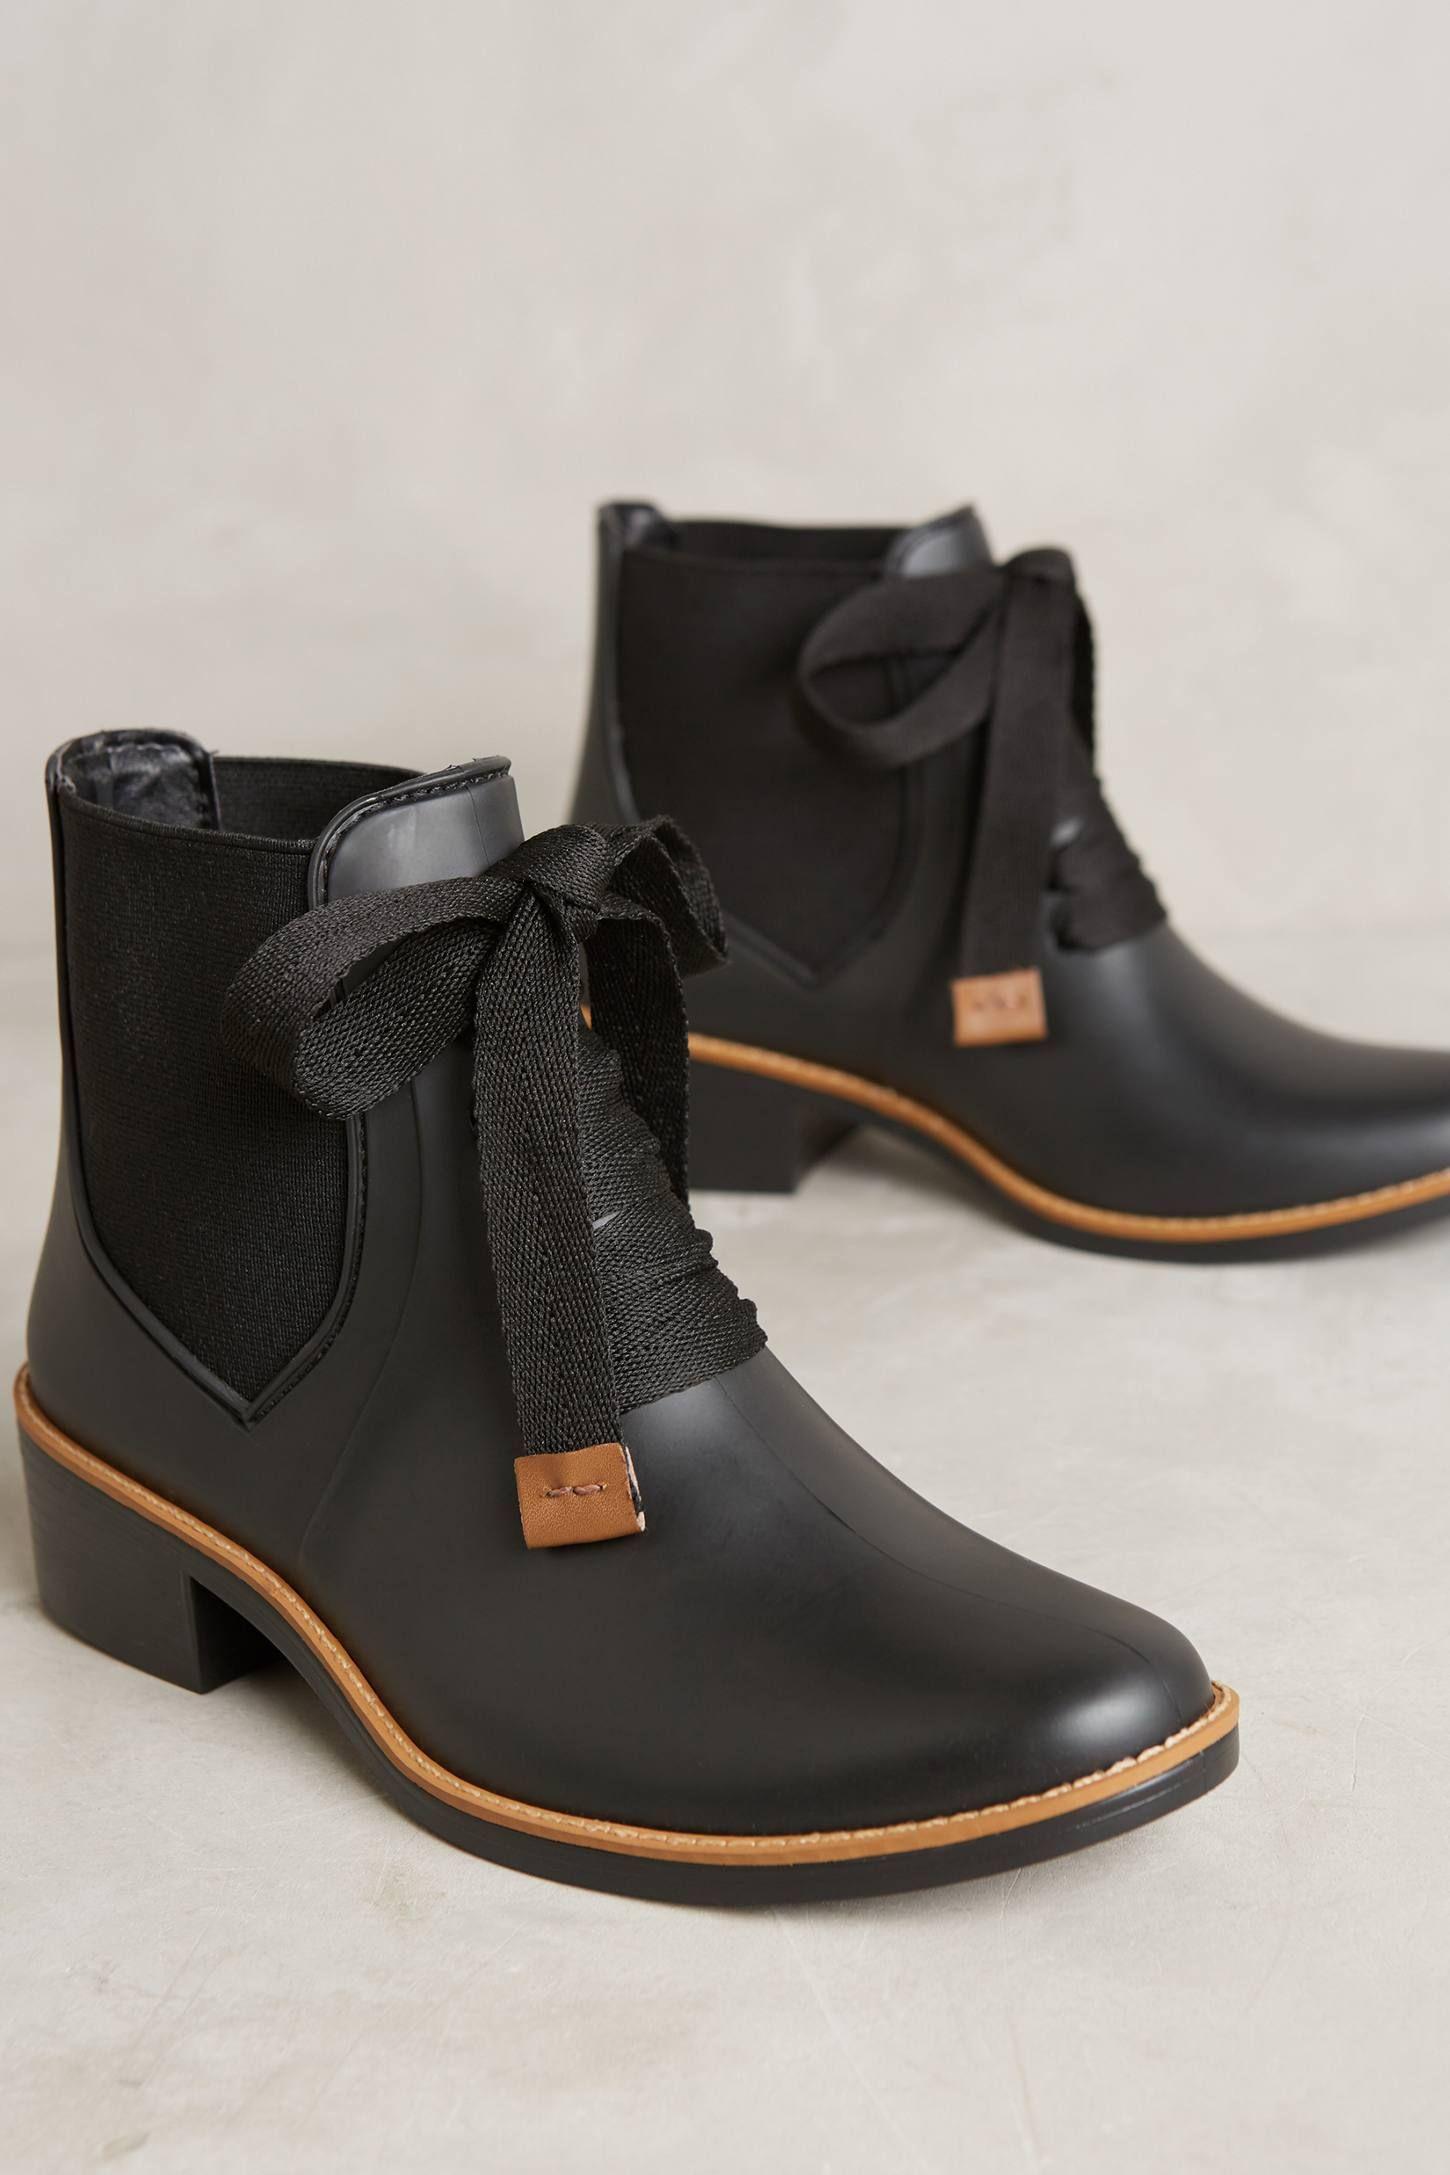 c7fd616e5a7 Slide View  1  Bernardo Lacey Rain Boots